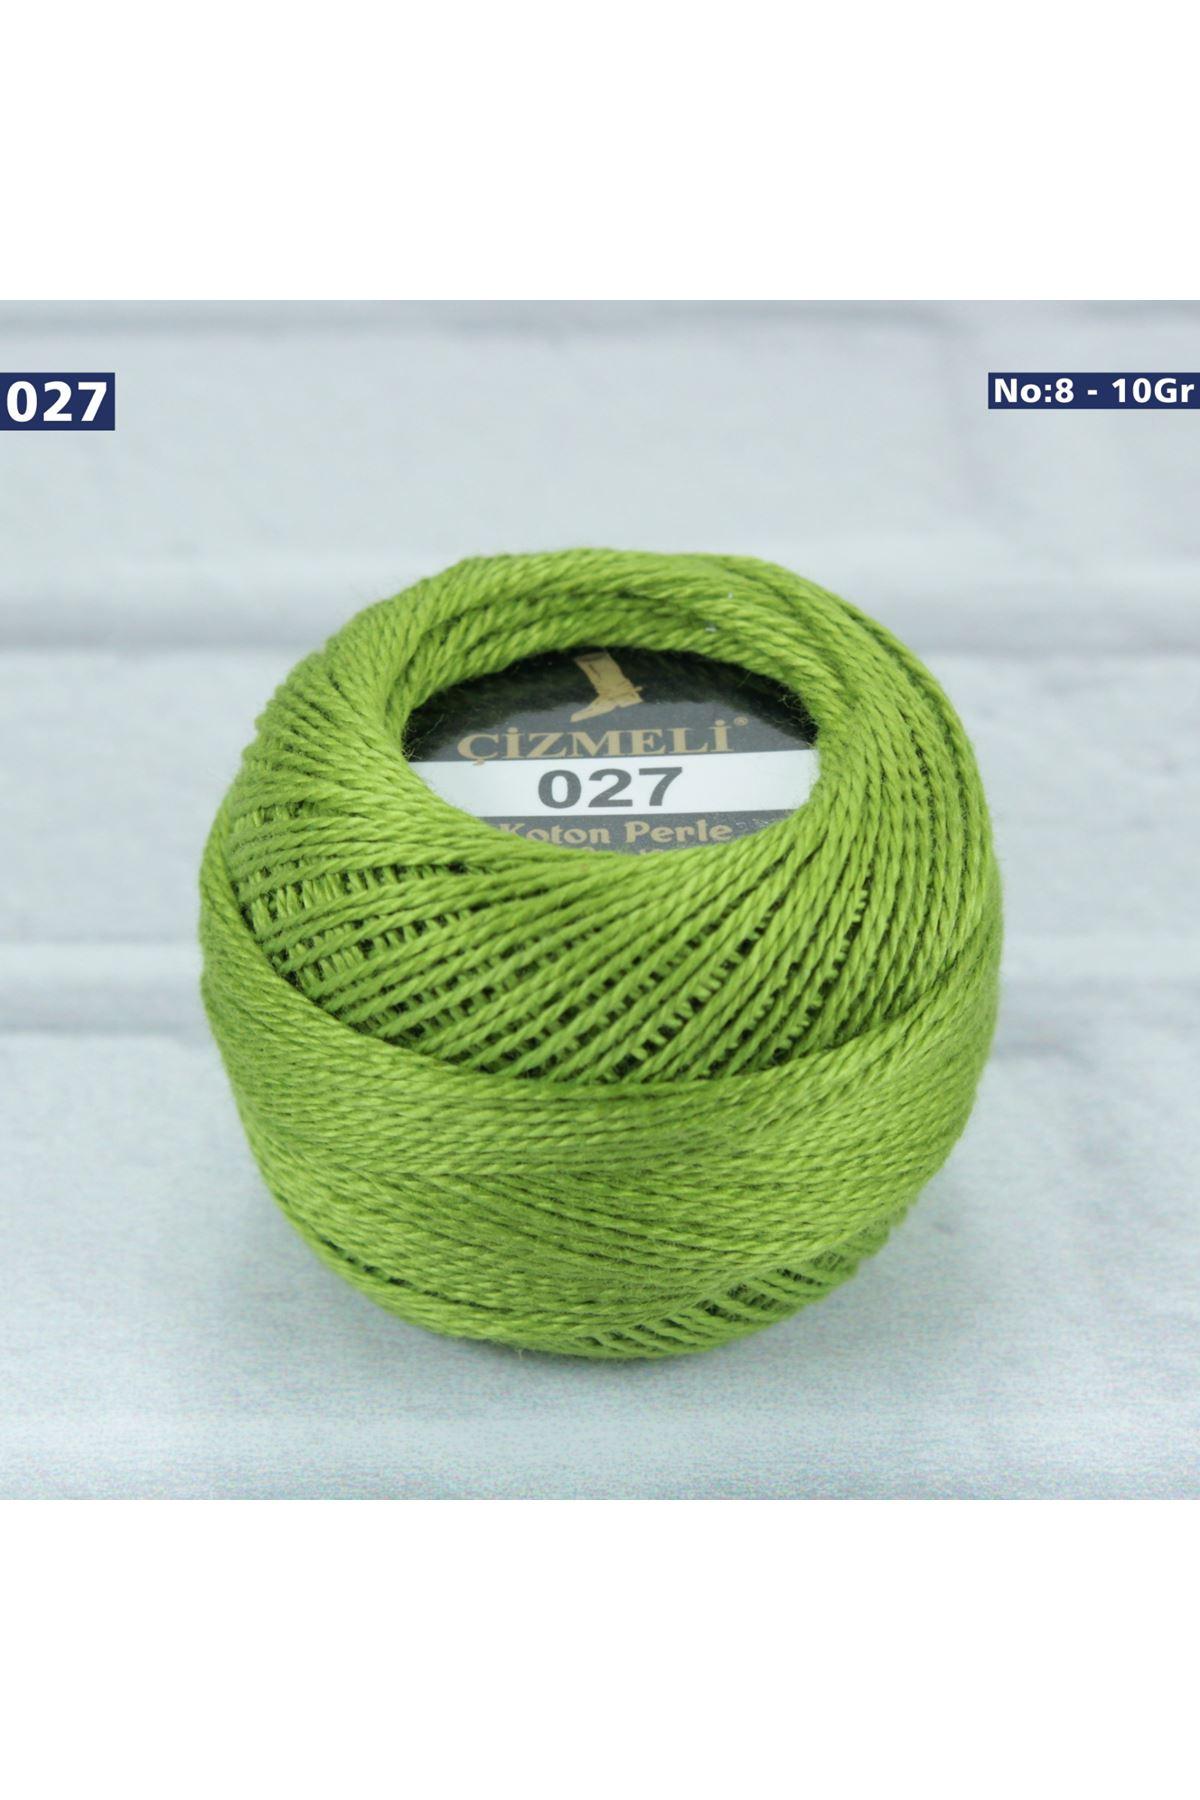 Çizmeli Cotton Perle Nakış İpliği No: 027